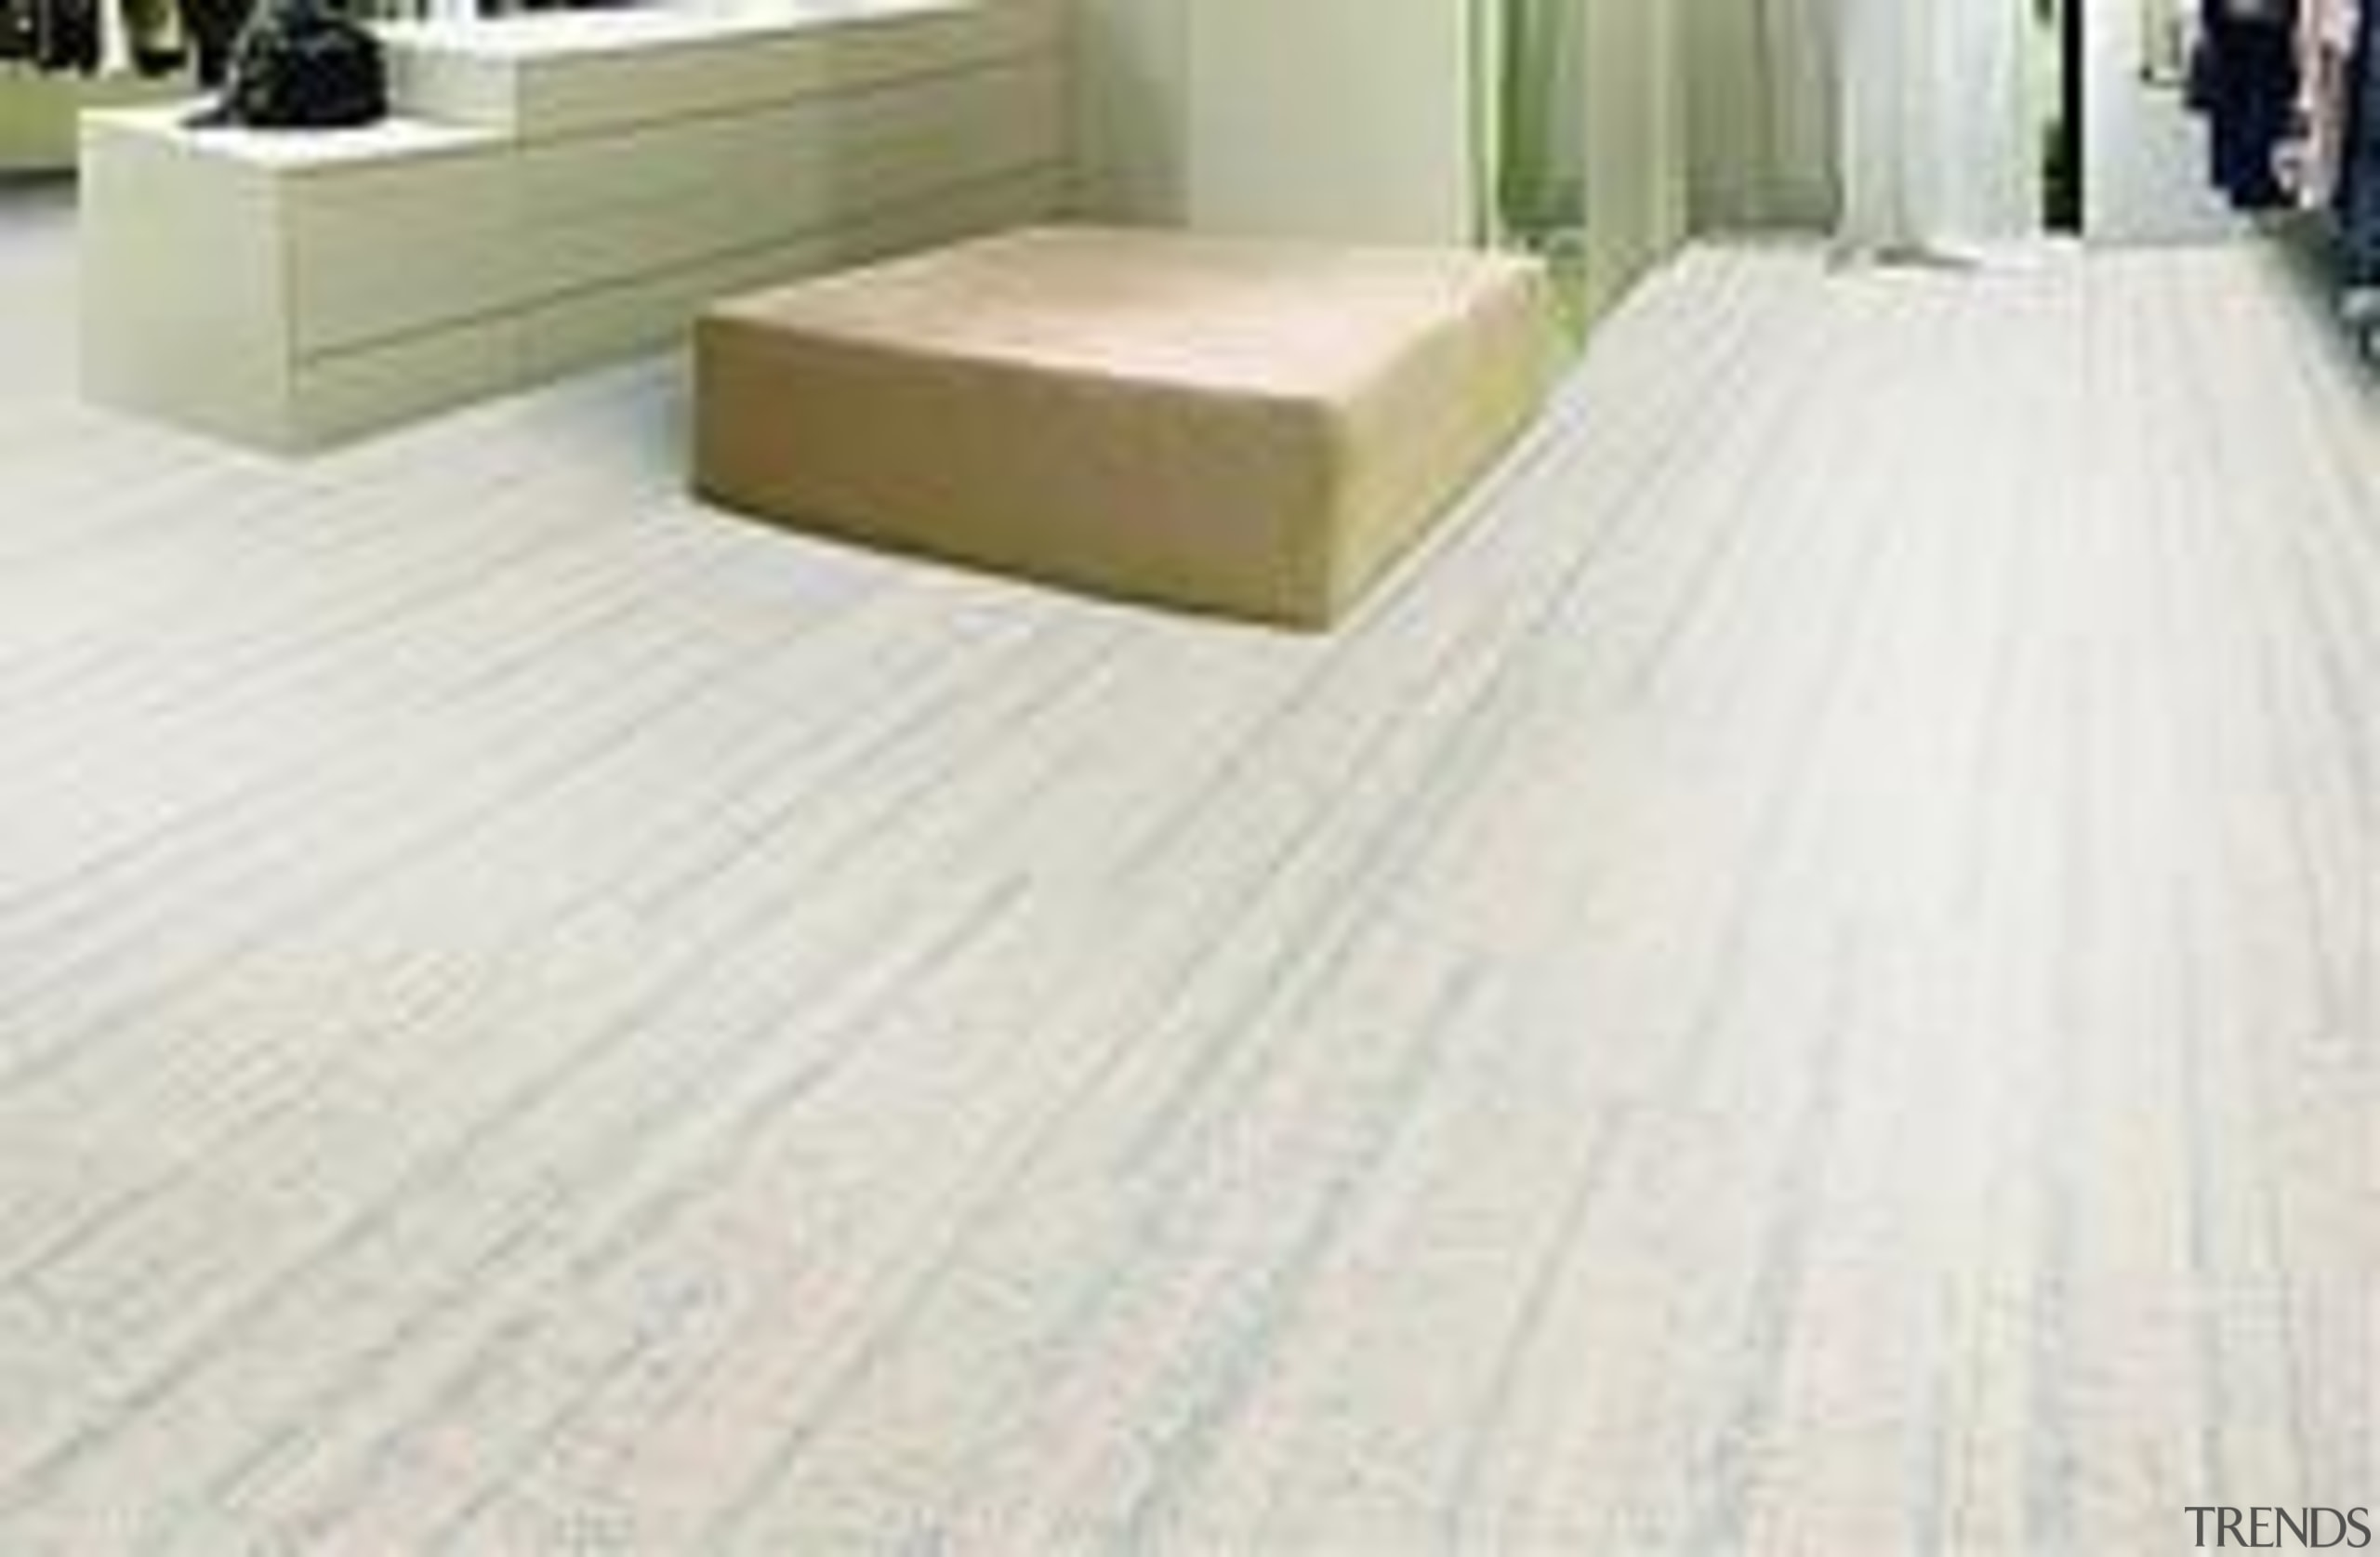 Cork Comfort Lane Timide - Cork Comfort Lane floor, flooring, hardwood, laminate flooring, plywood, property, tile, wood, wood flooring, wood stain, white